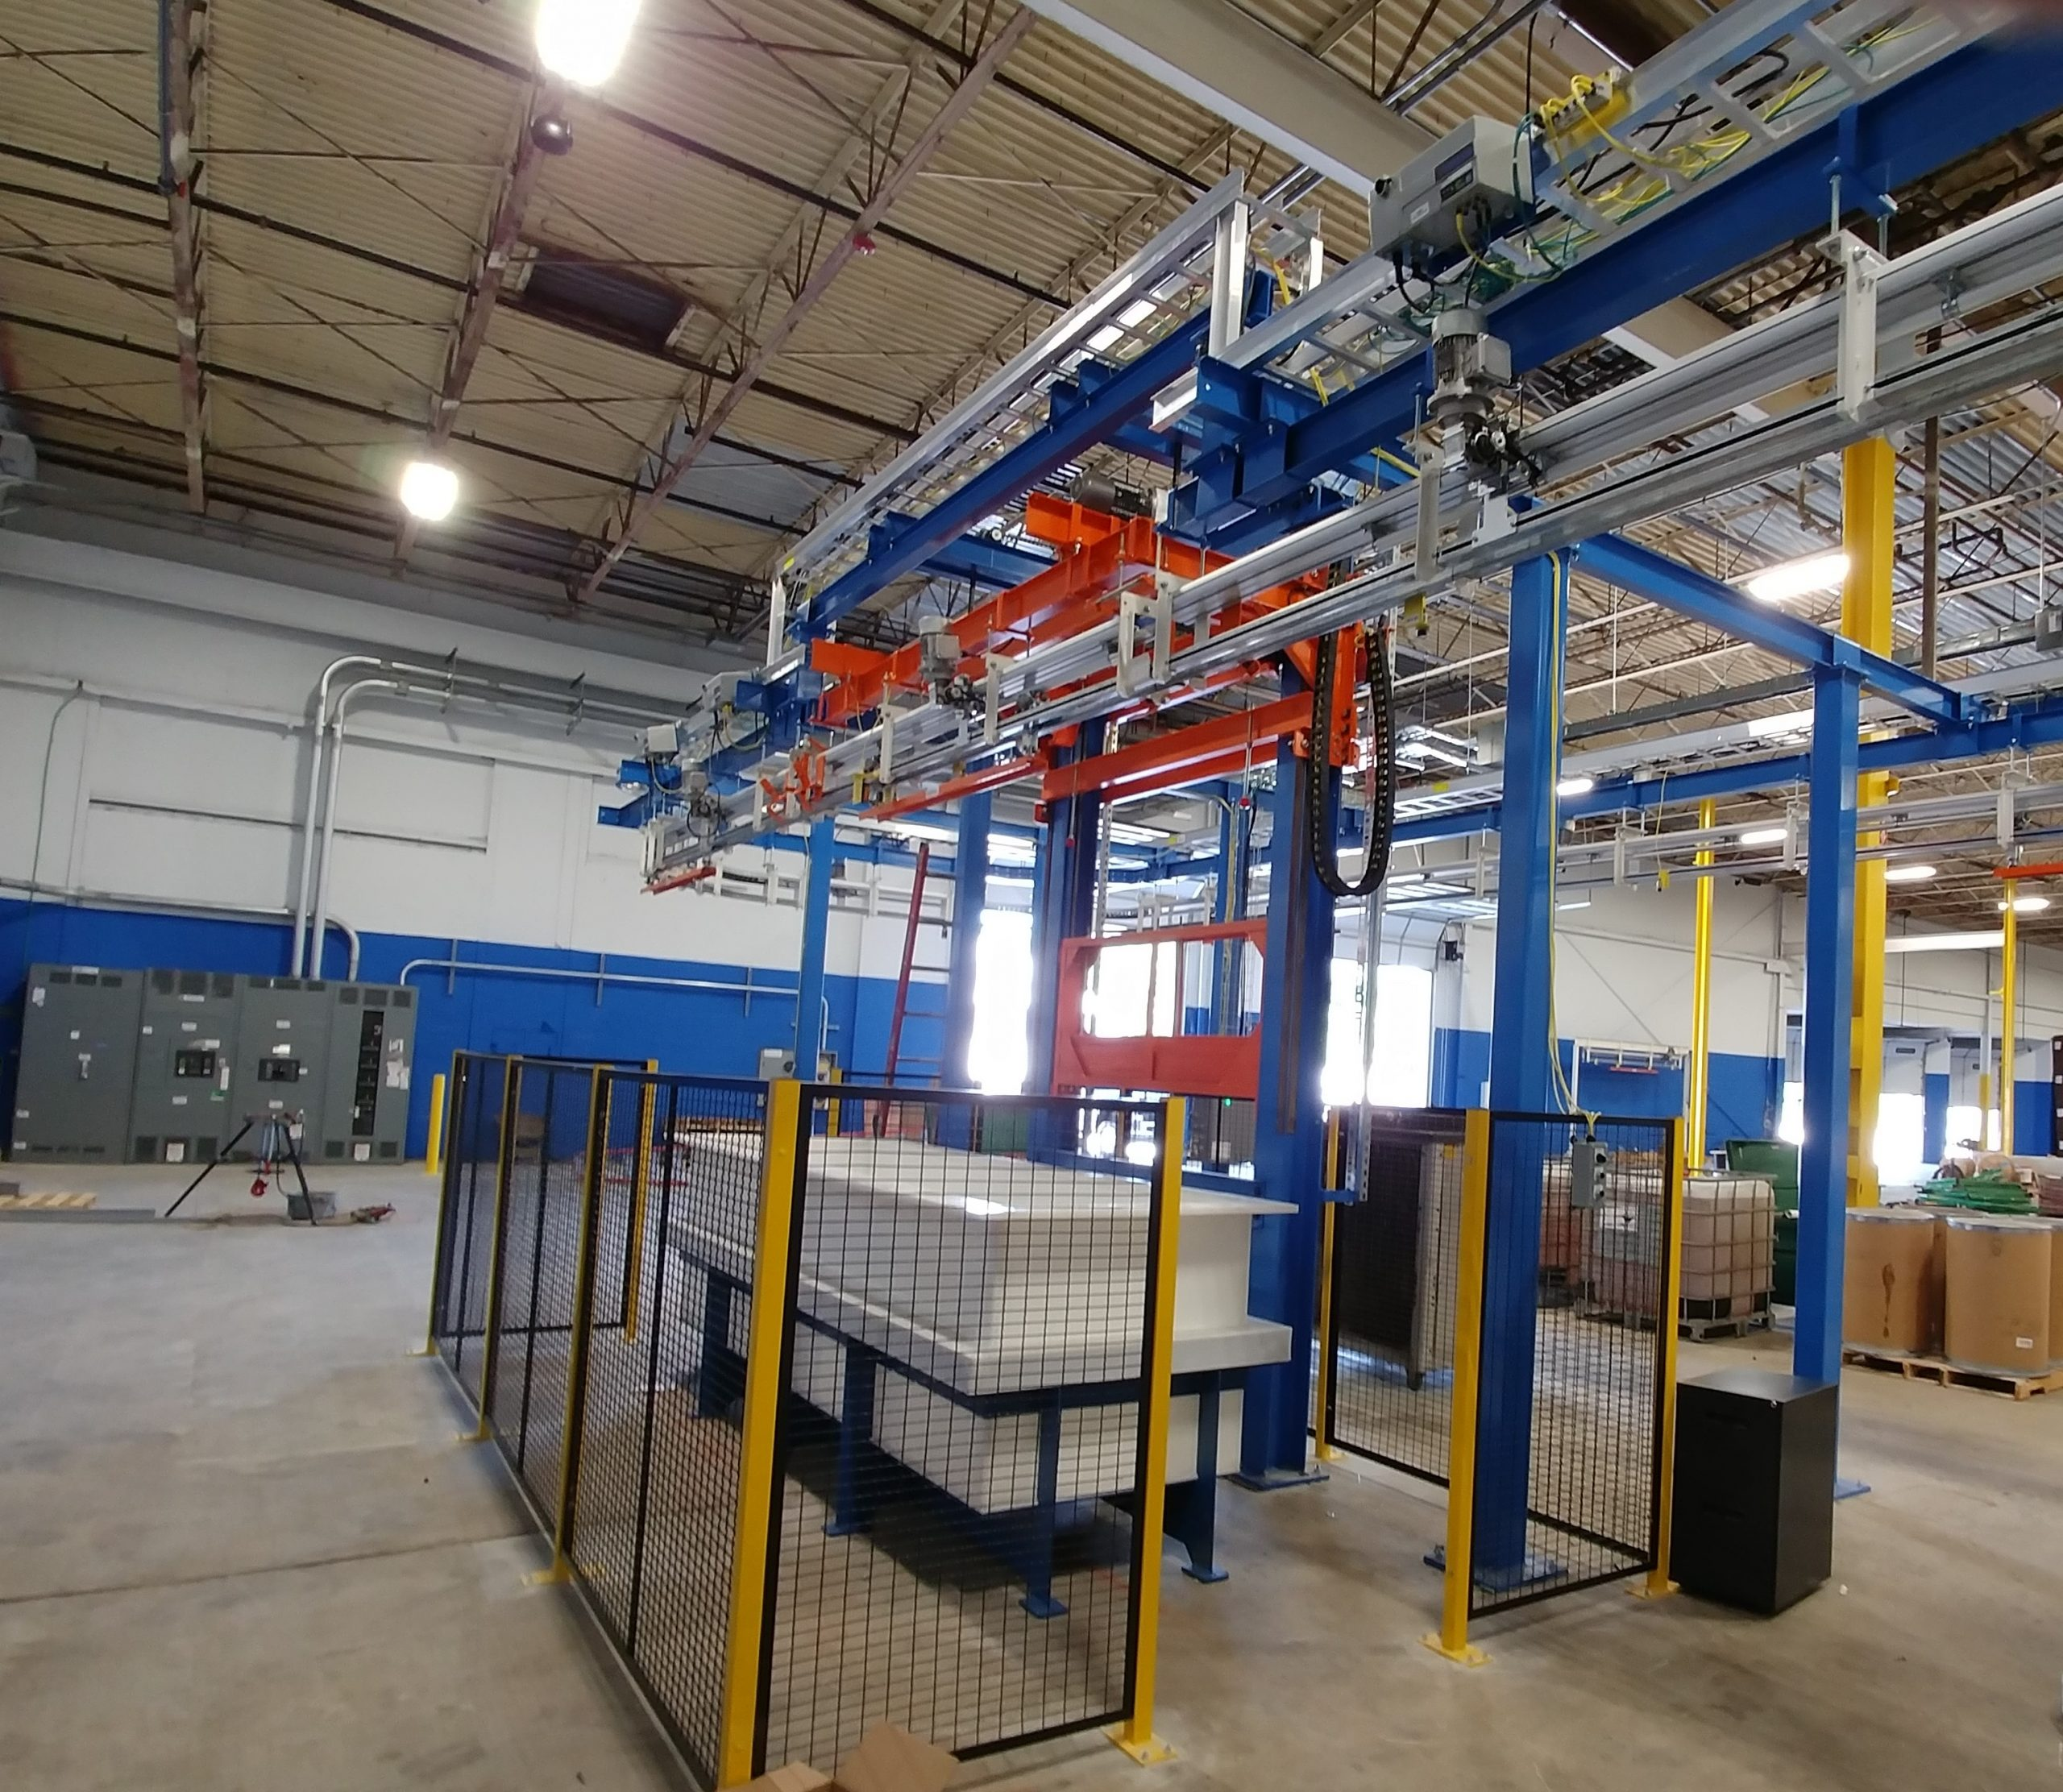 IntelliTrak 500 Series Overhead Conveyor - Building Products Galvanizing System